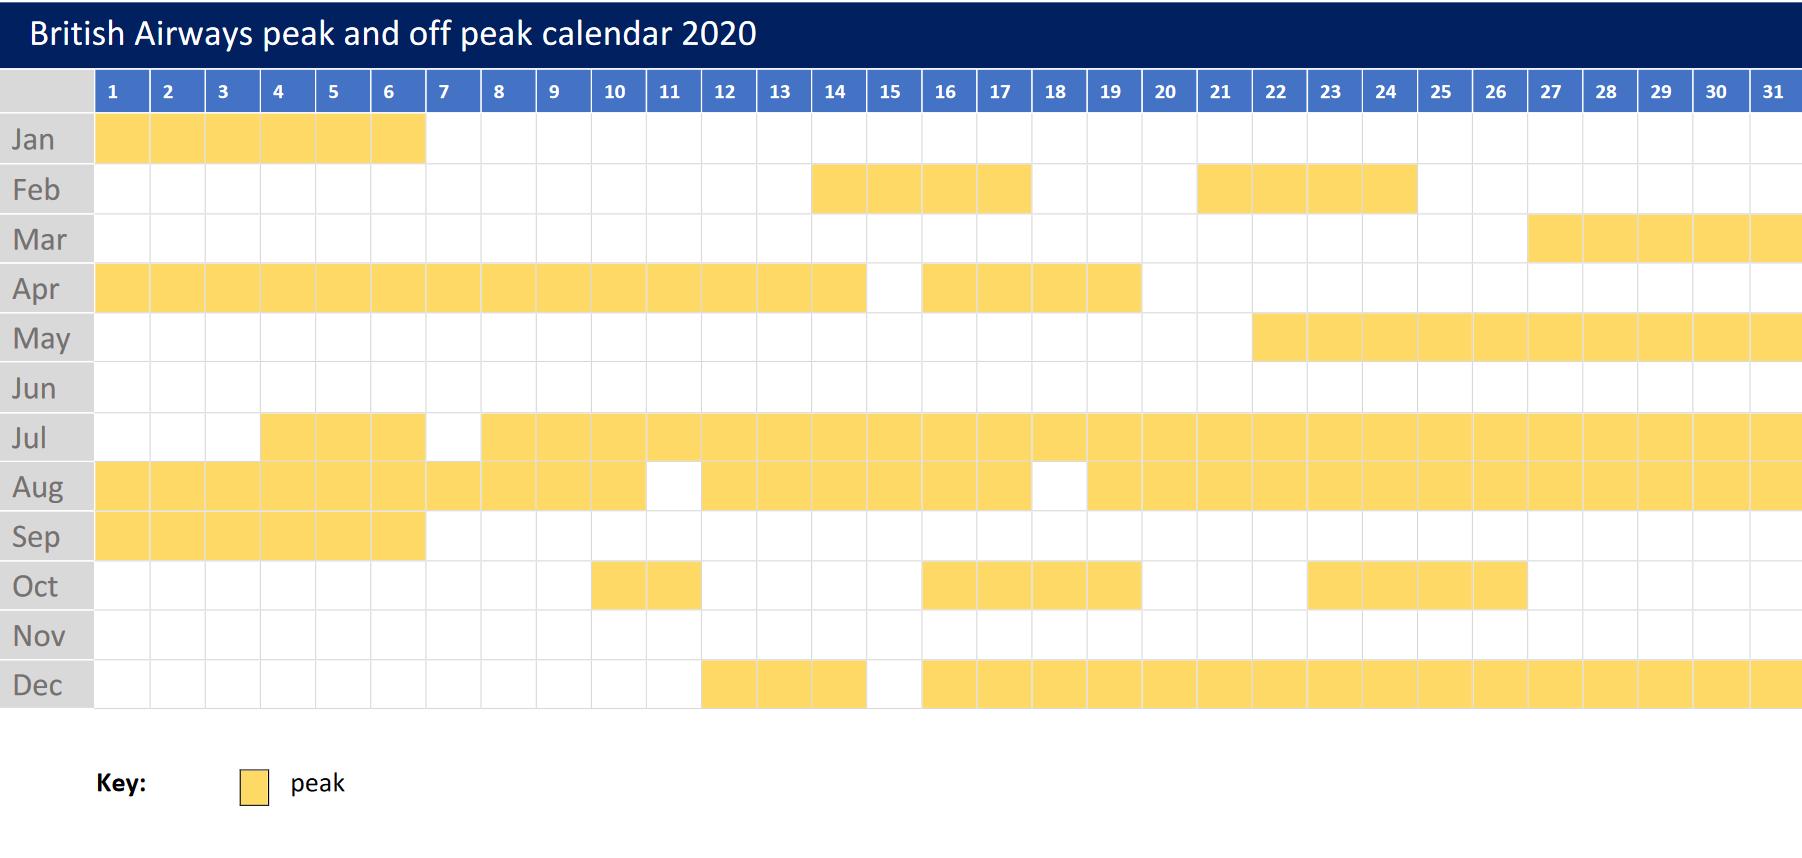 Word, Insert, Calendar, November 2017 - February 2020 British Airways 2020 peak and off peak Avios calendar